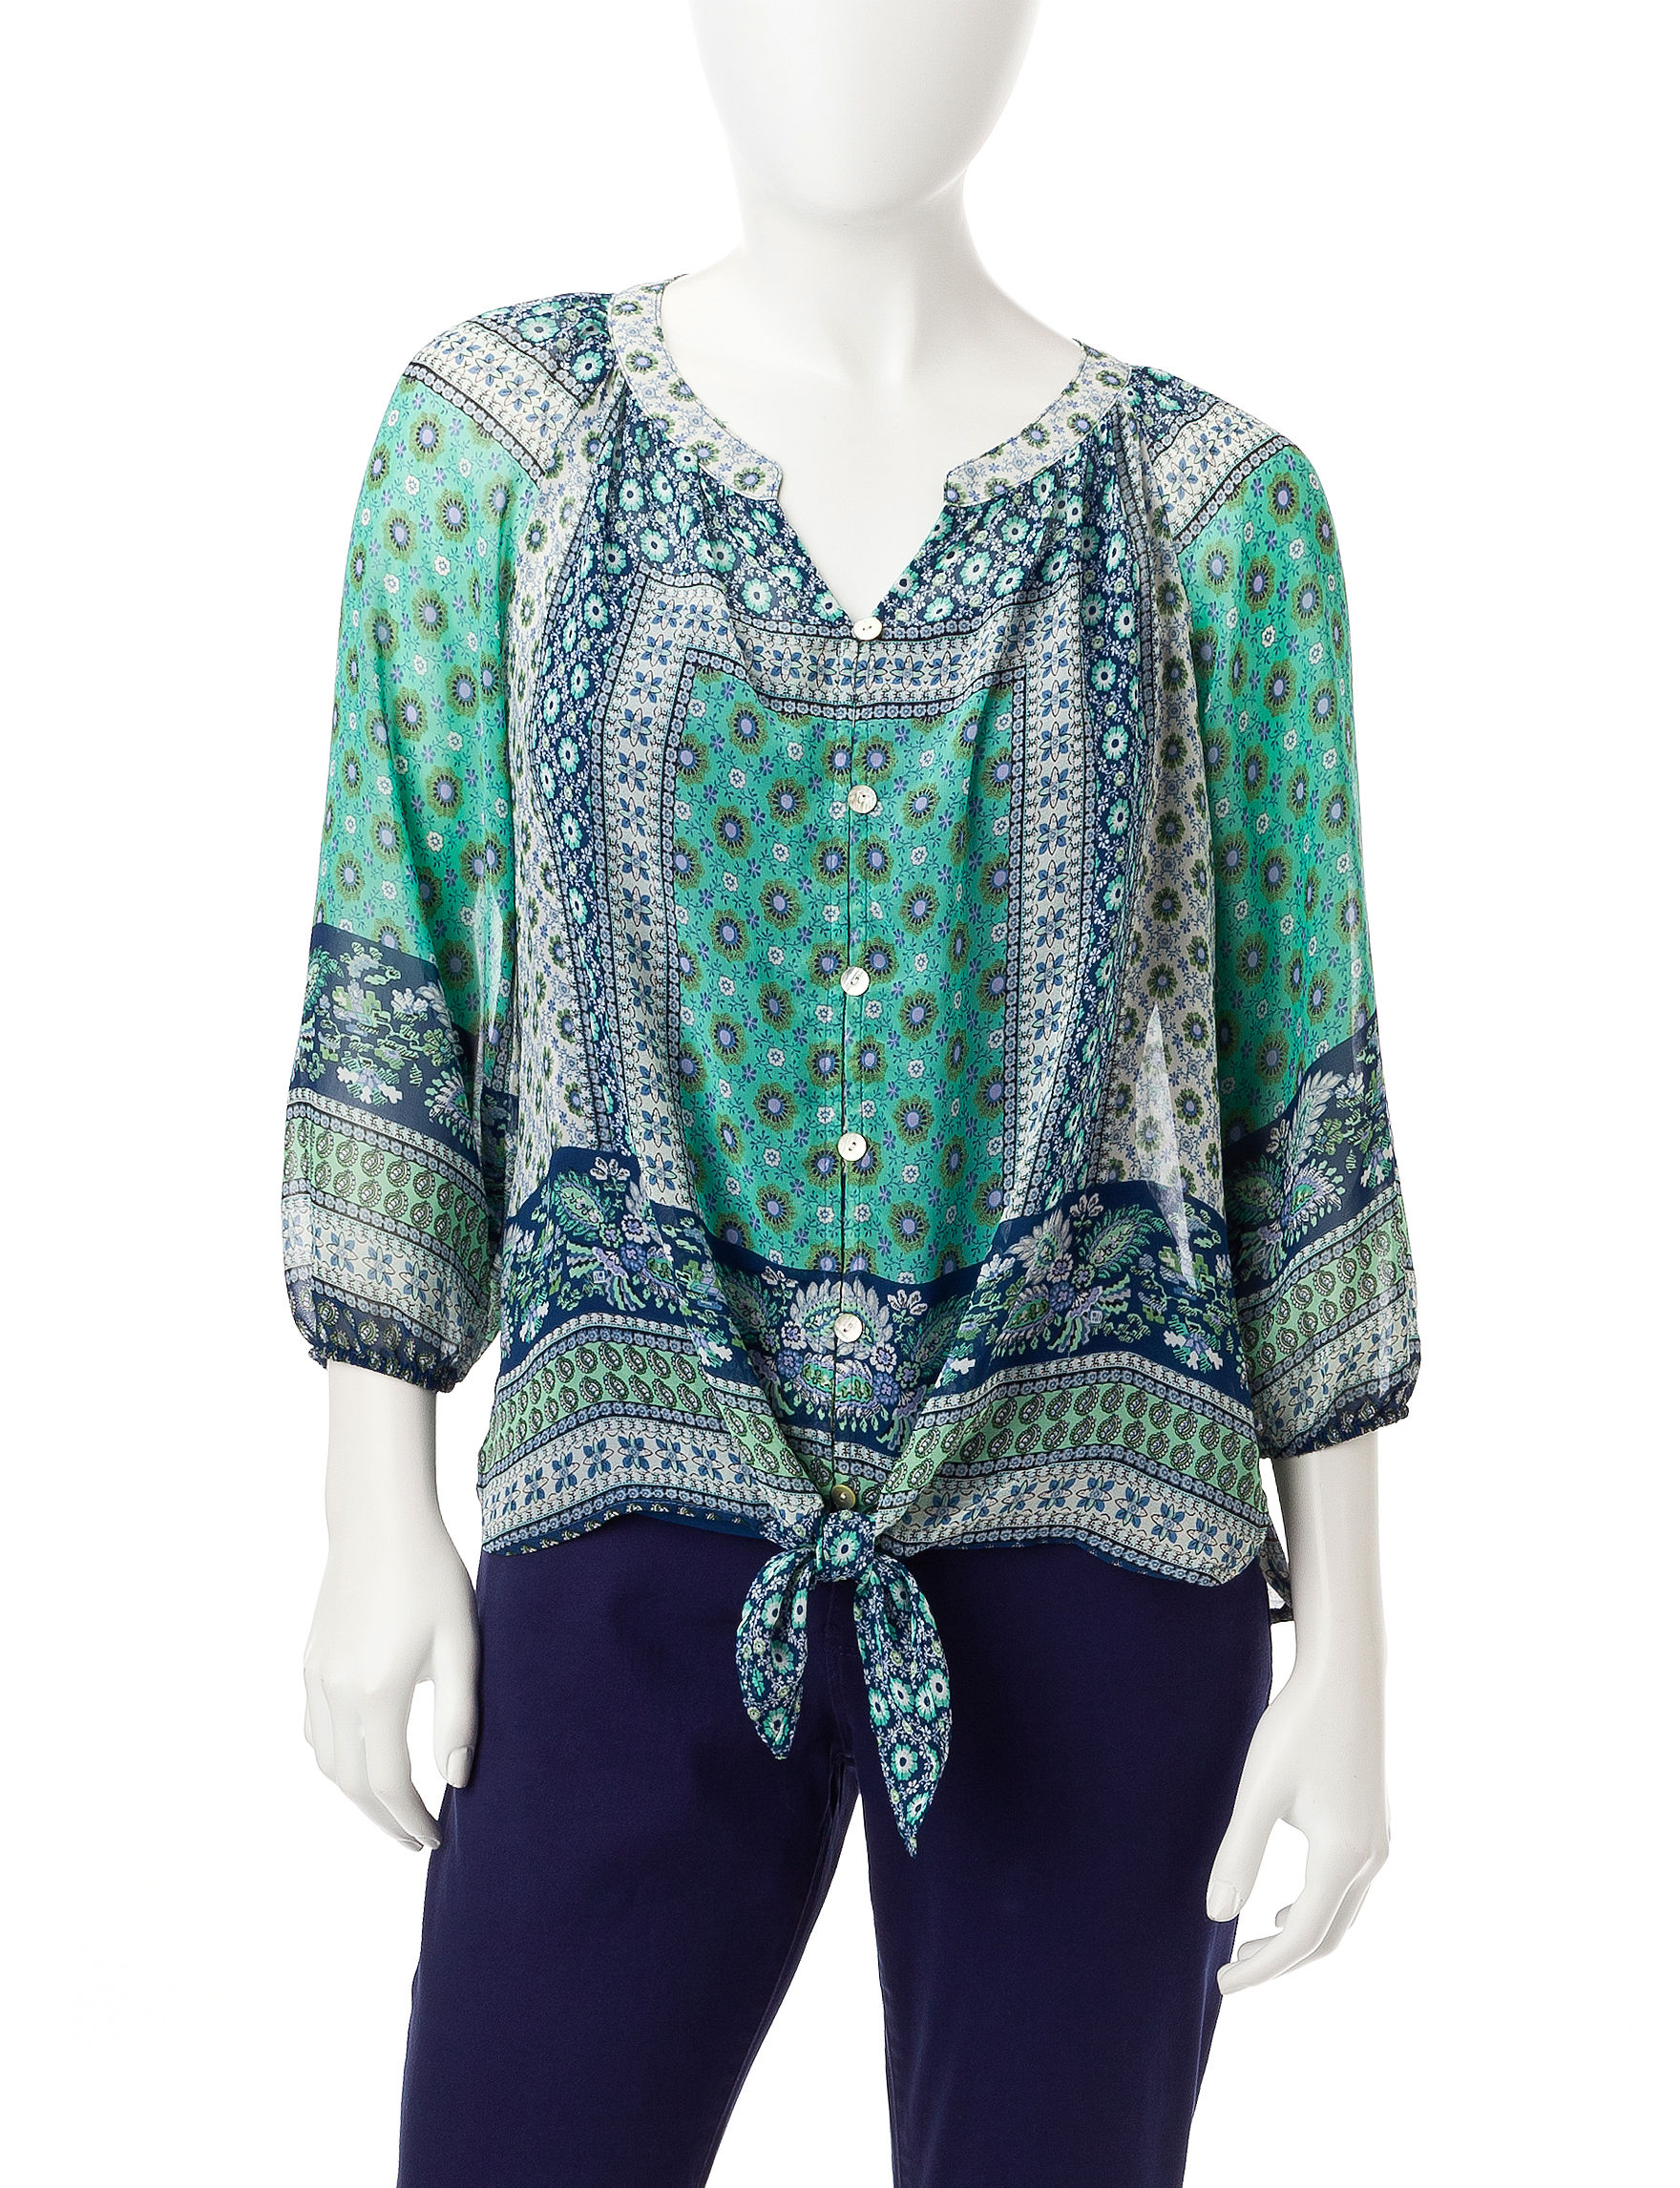 Figuero & Flower Seafoam Shirts & Blouses